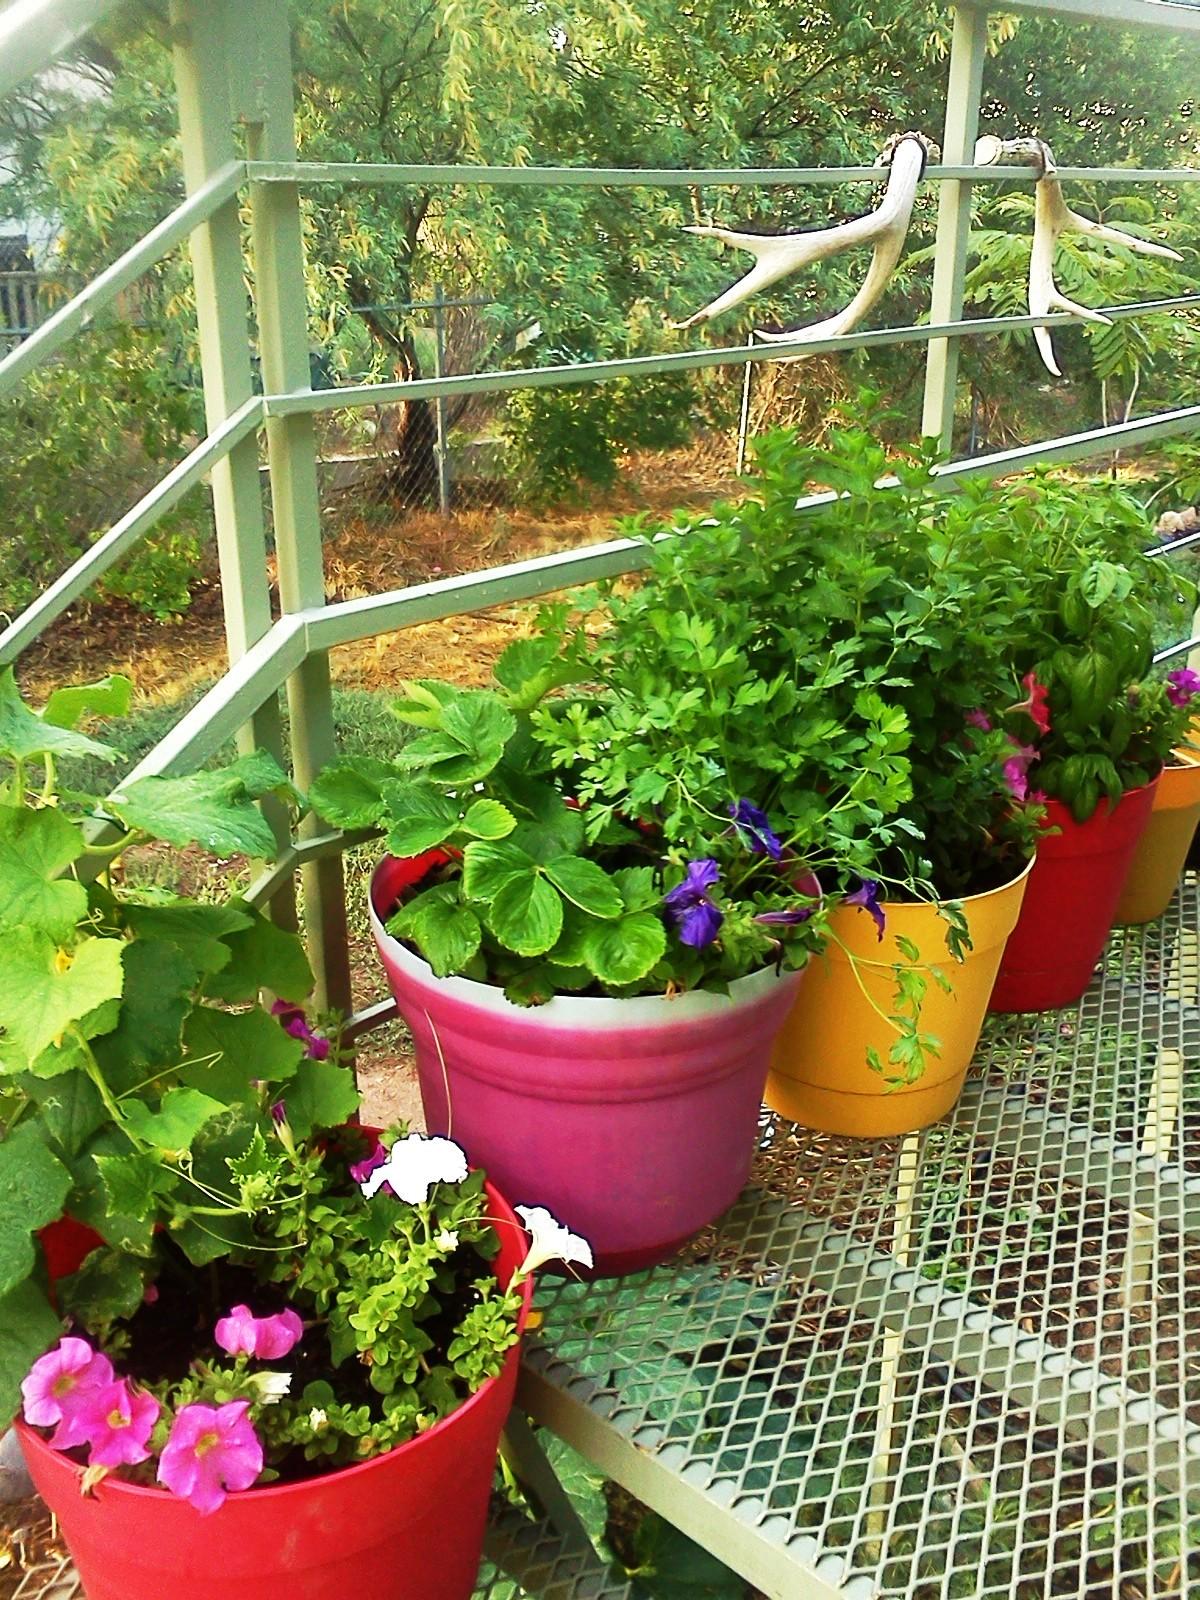 garden July 2015 002.jpg